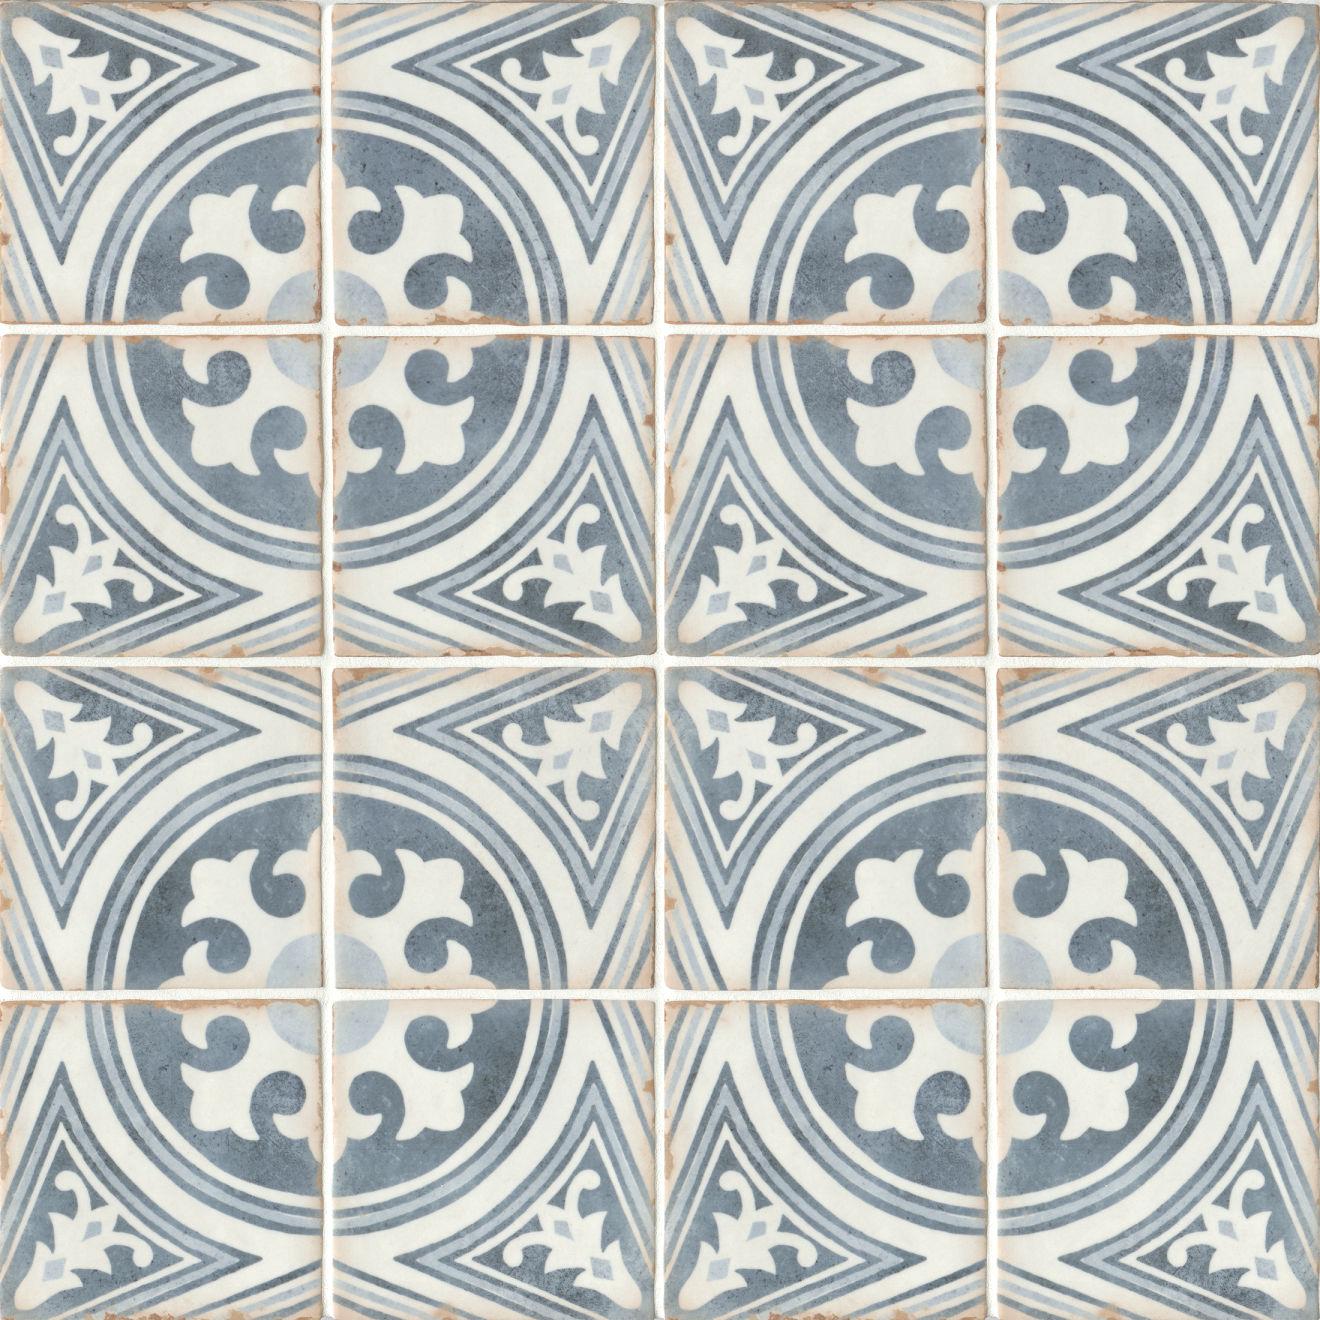 "Casablanca 5"" x 5"" Matte Ceramic Floor and Wall Tile in Anfa"